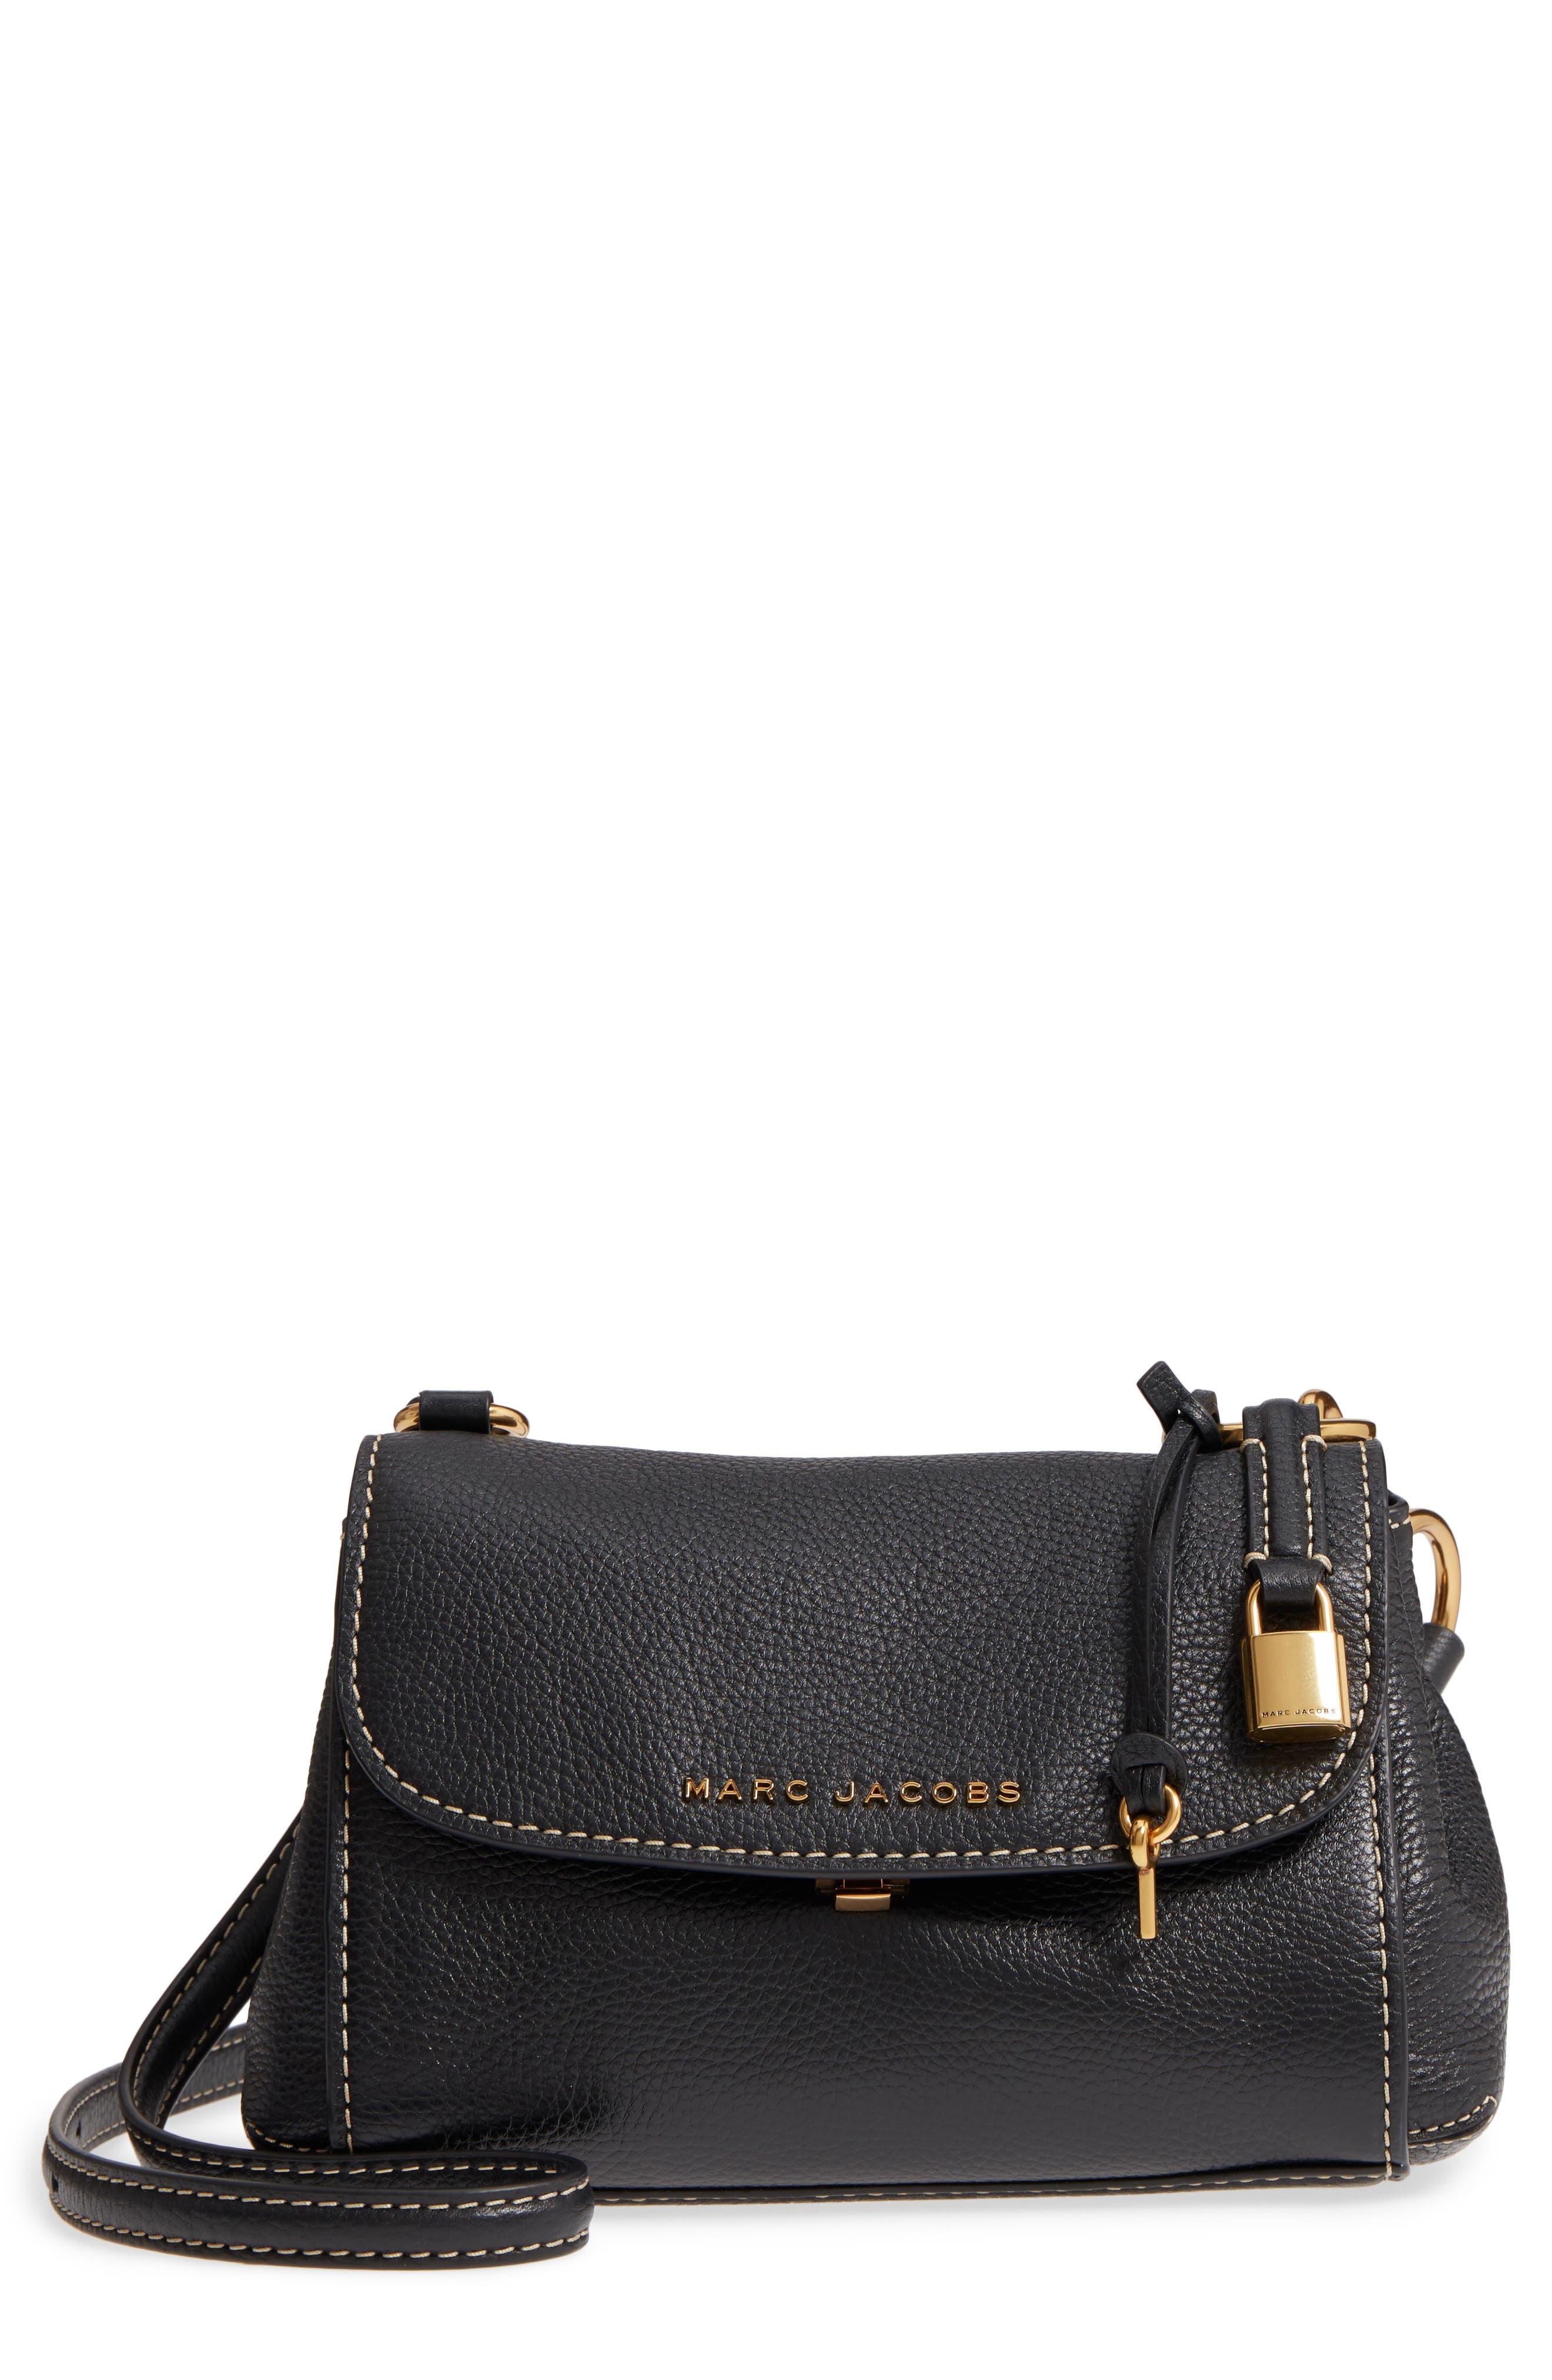 Mini The Boho Grind Leather Shoulder Bag,                             Main thumbnail 1, color,                             014